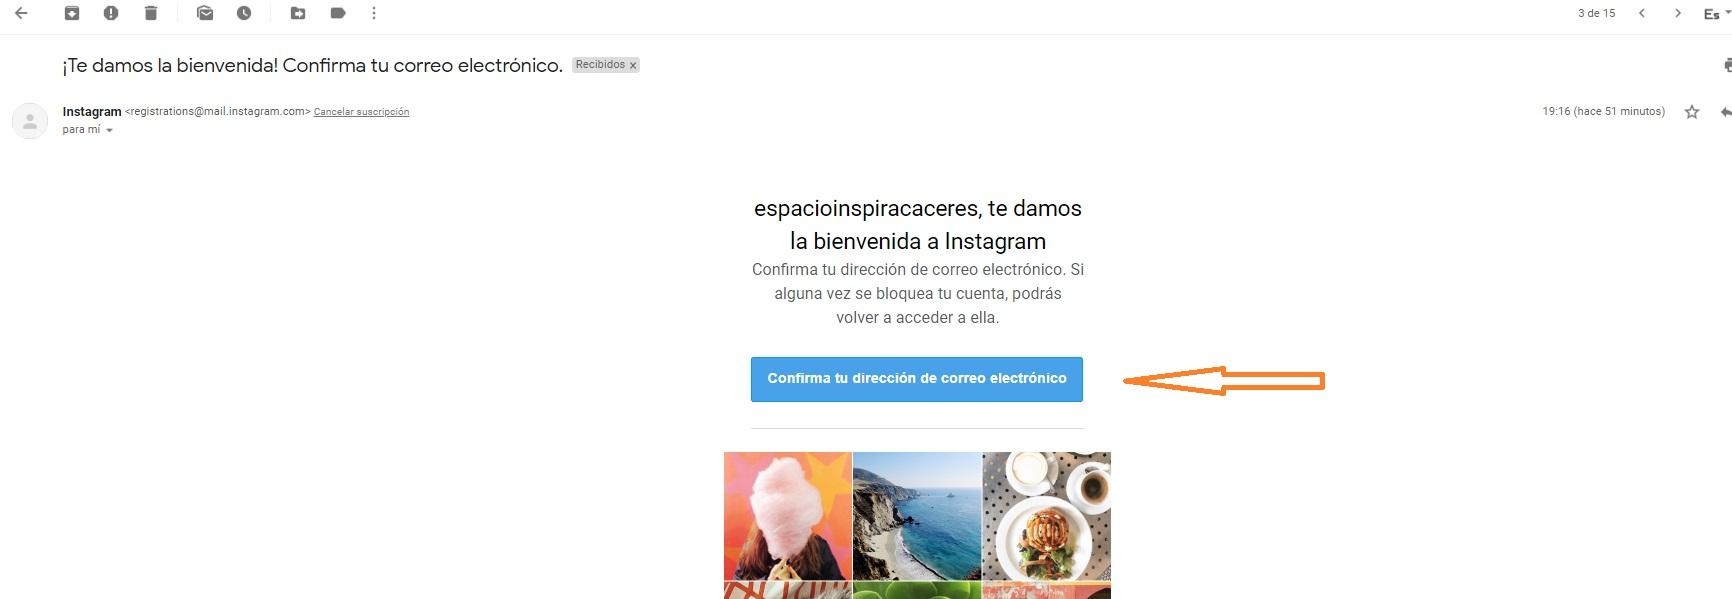 abrir perfil instagram nuevo elementos verificar email